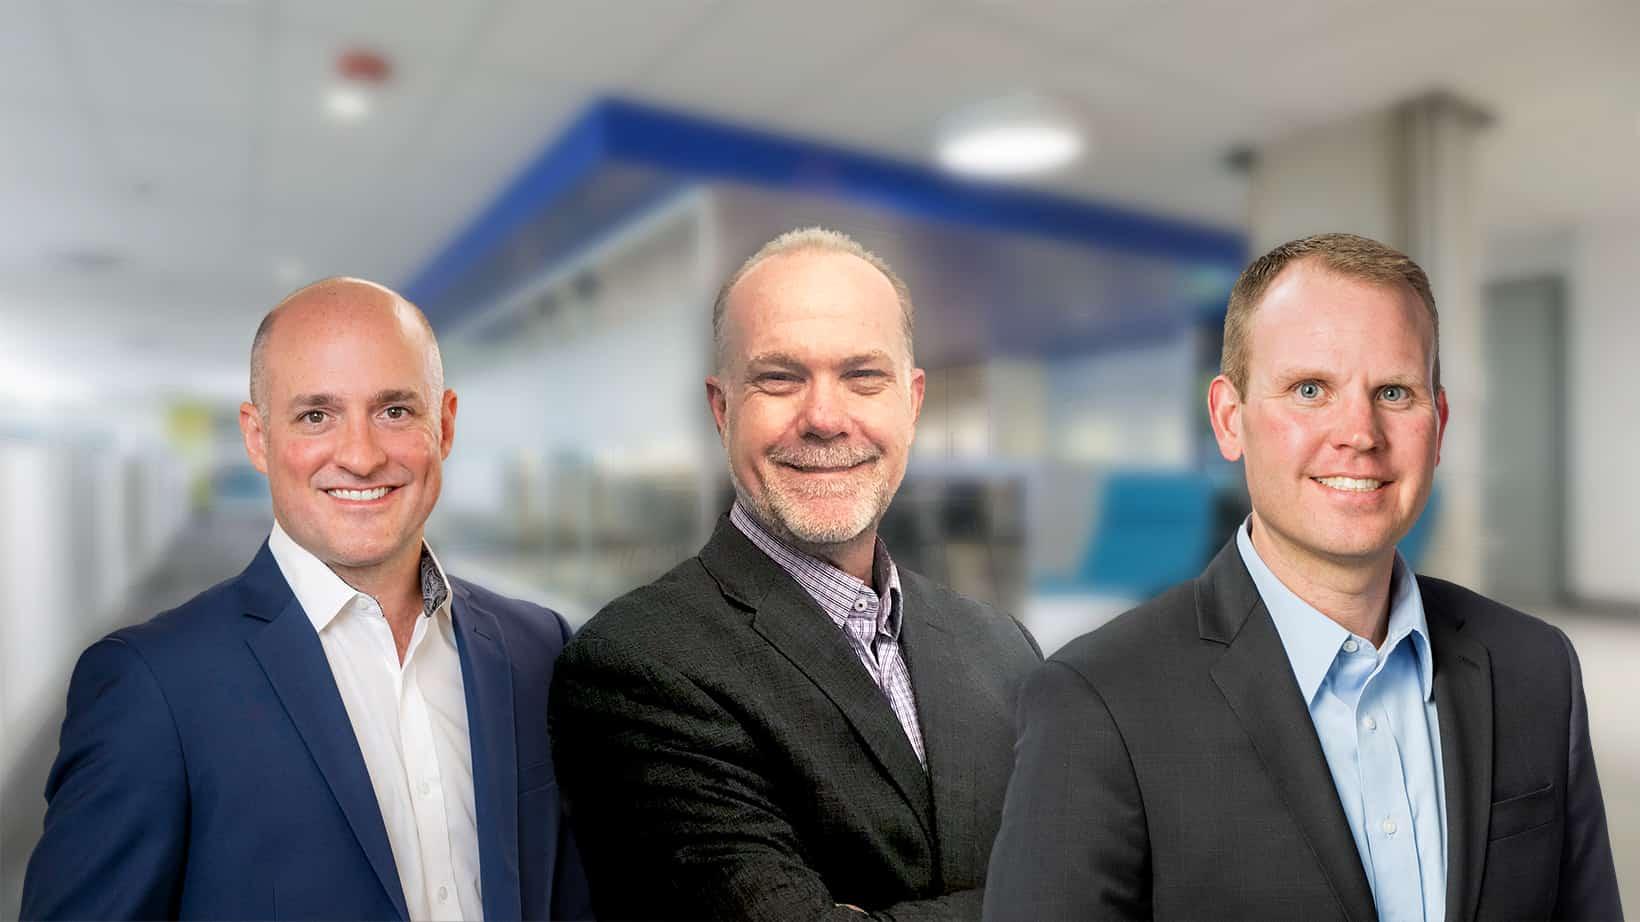 Aaron Campbell, Mark Timbrook and Brian Sauer